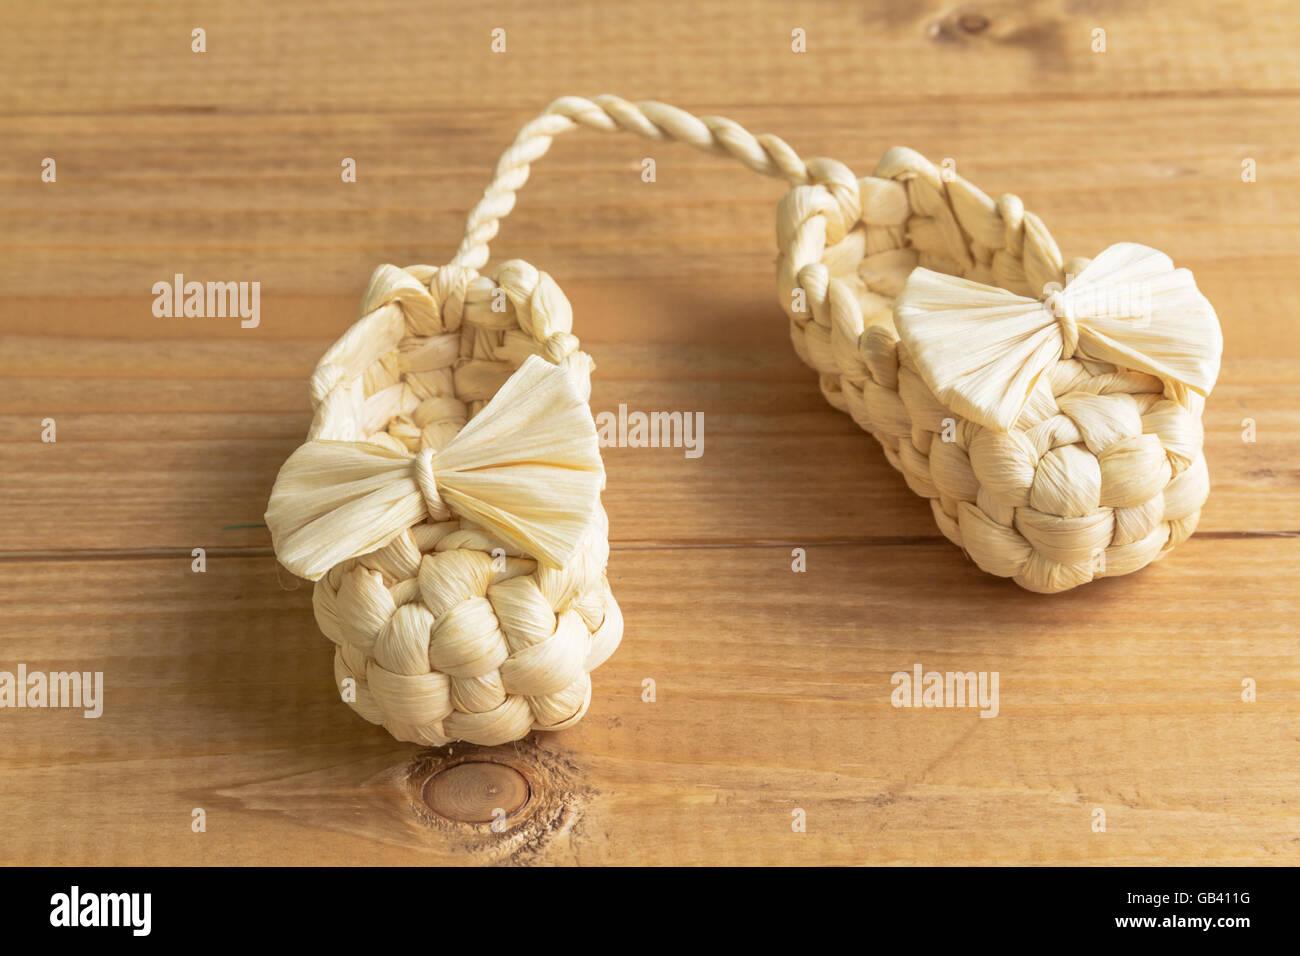 Bast shoes souvenir beige pair on the table - Stock Image